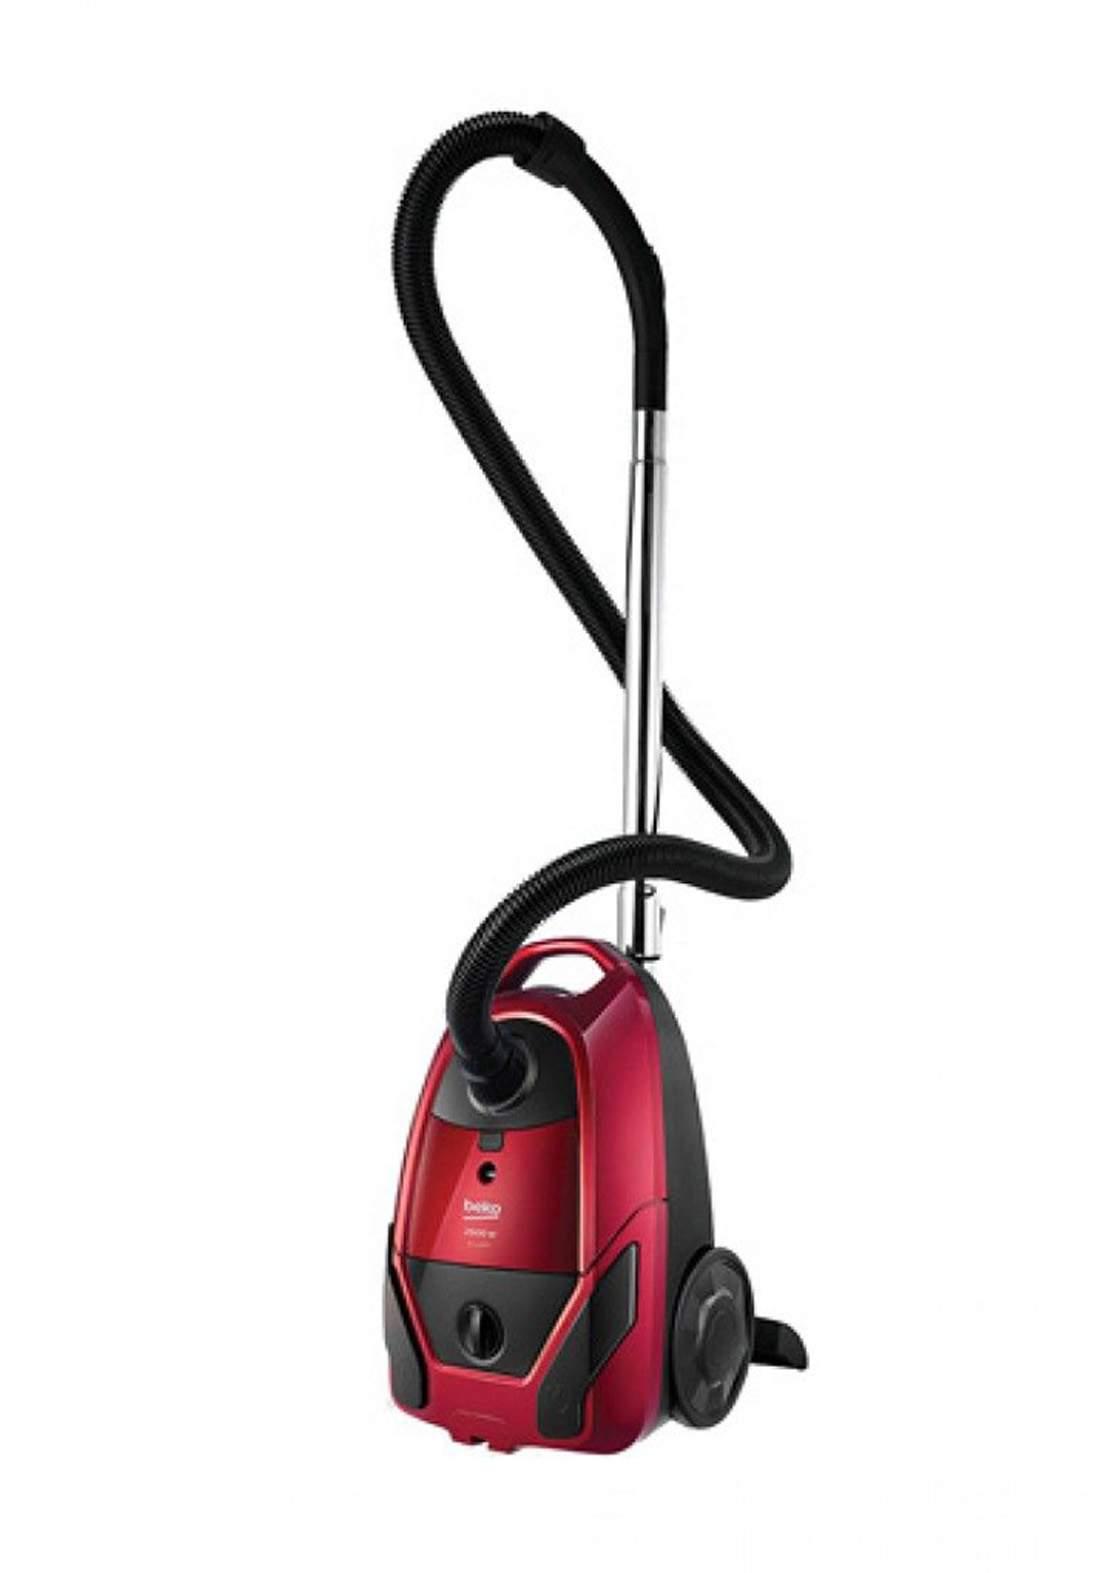 Beko (  BKS 2226) Vacuum Cleaner Wet and Dry 2600  Watts  - Red  مكنسة كهربائية